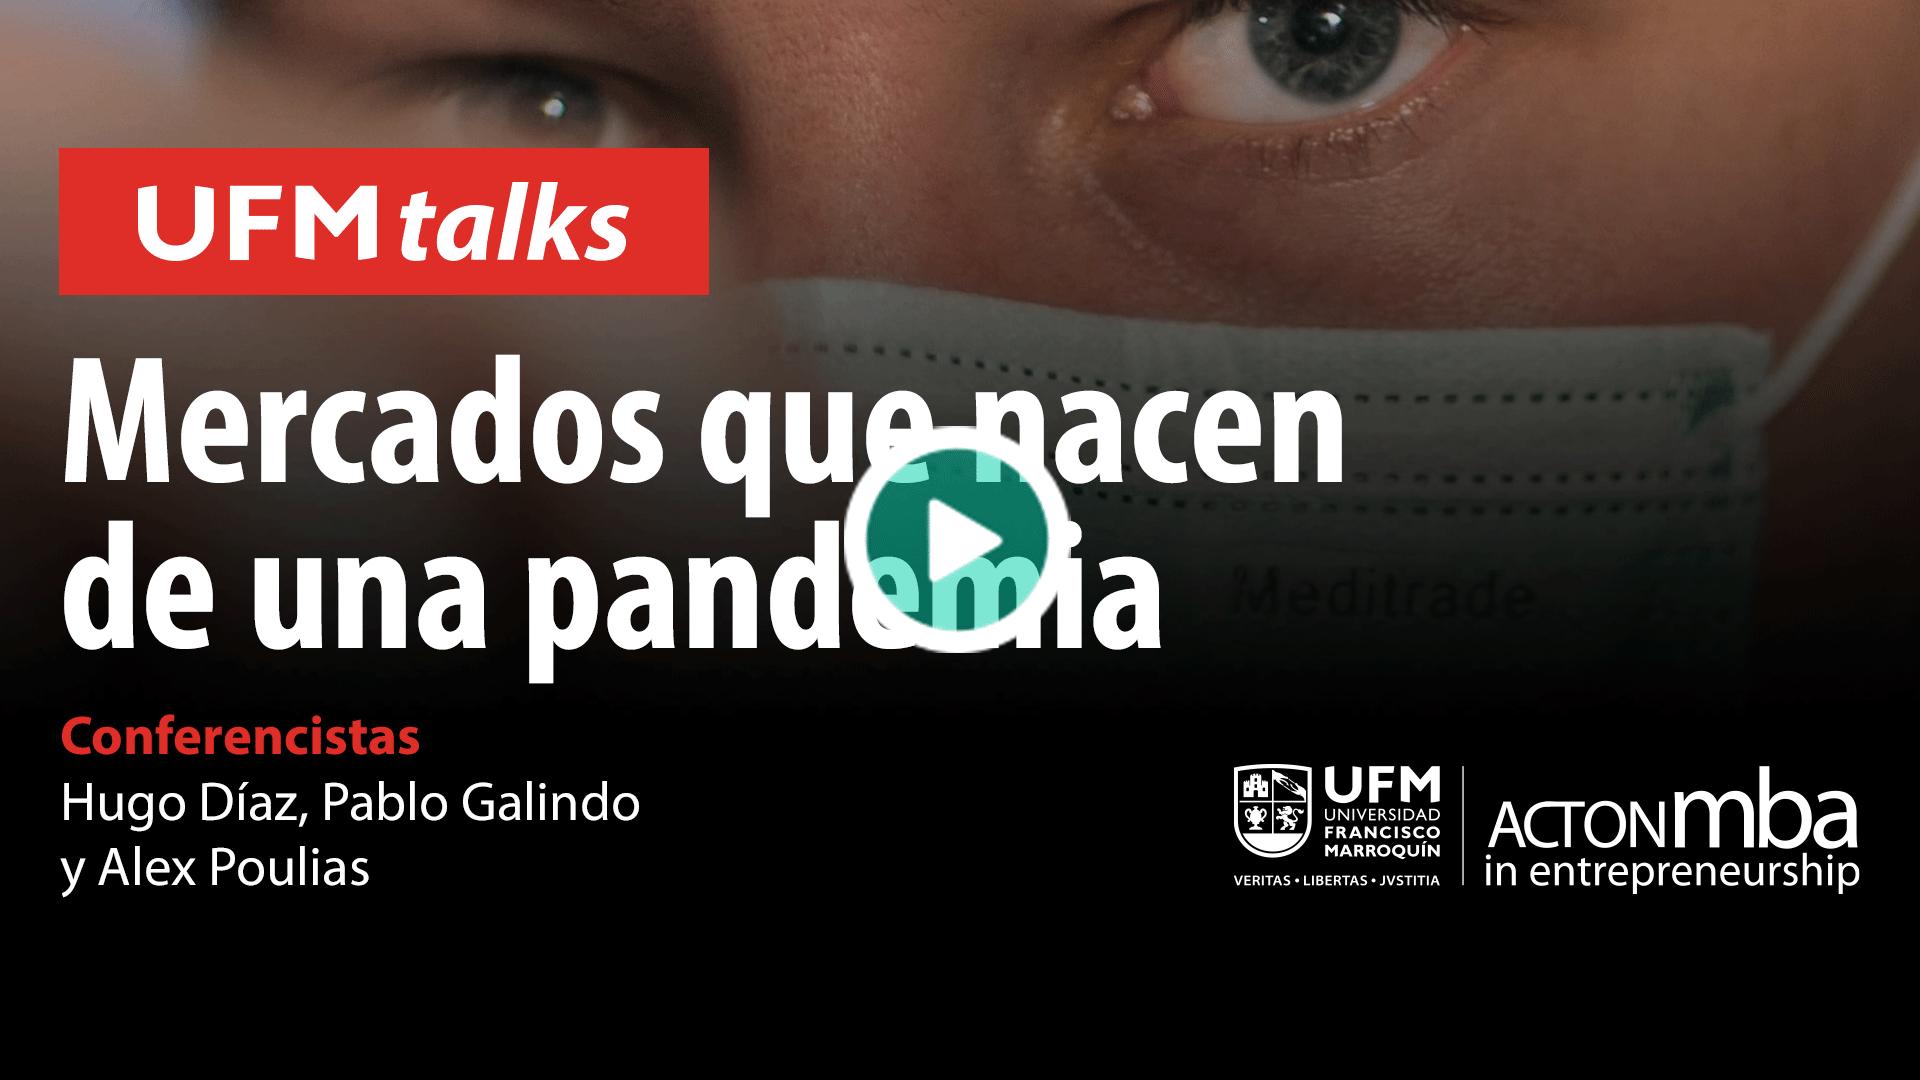 20200624_ufmtalks10_Mercados-que-nacen-de-una-pandemia